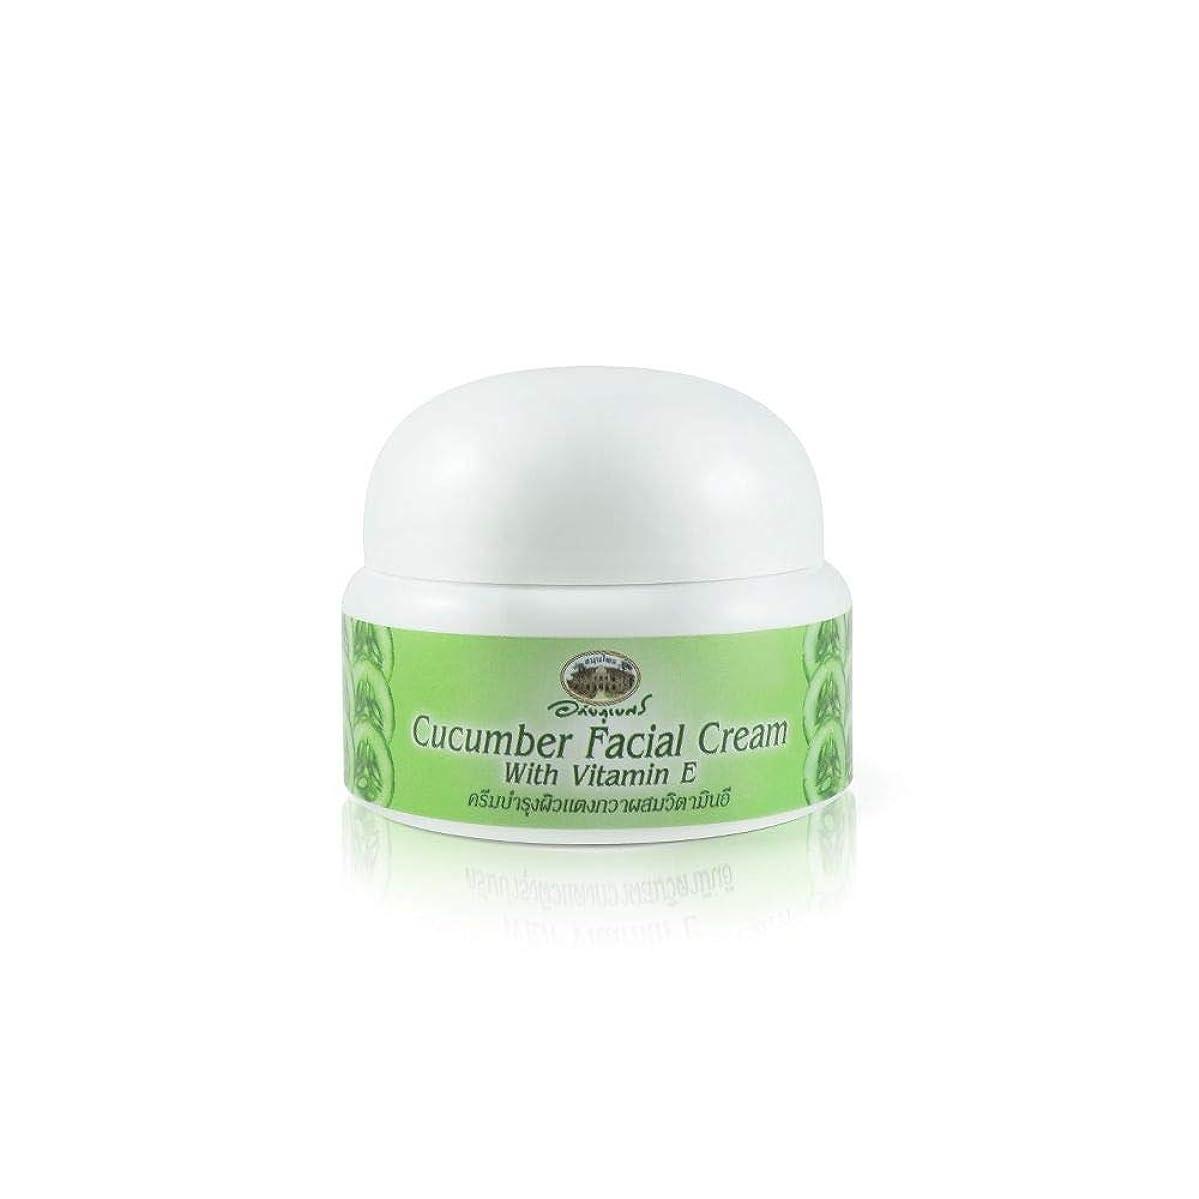 Abhaibhubejhr Cucumber Herbal Facial Cream With Vitamin E 40g. Abhaibhubejhrキュウリハーブフェイシャルクリーム(ビタミンE入り)40g